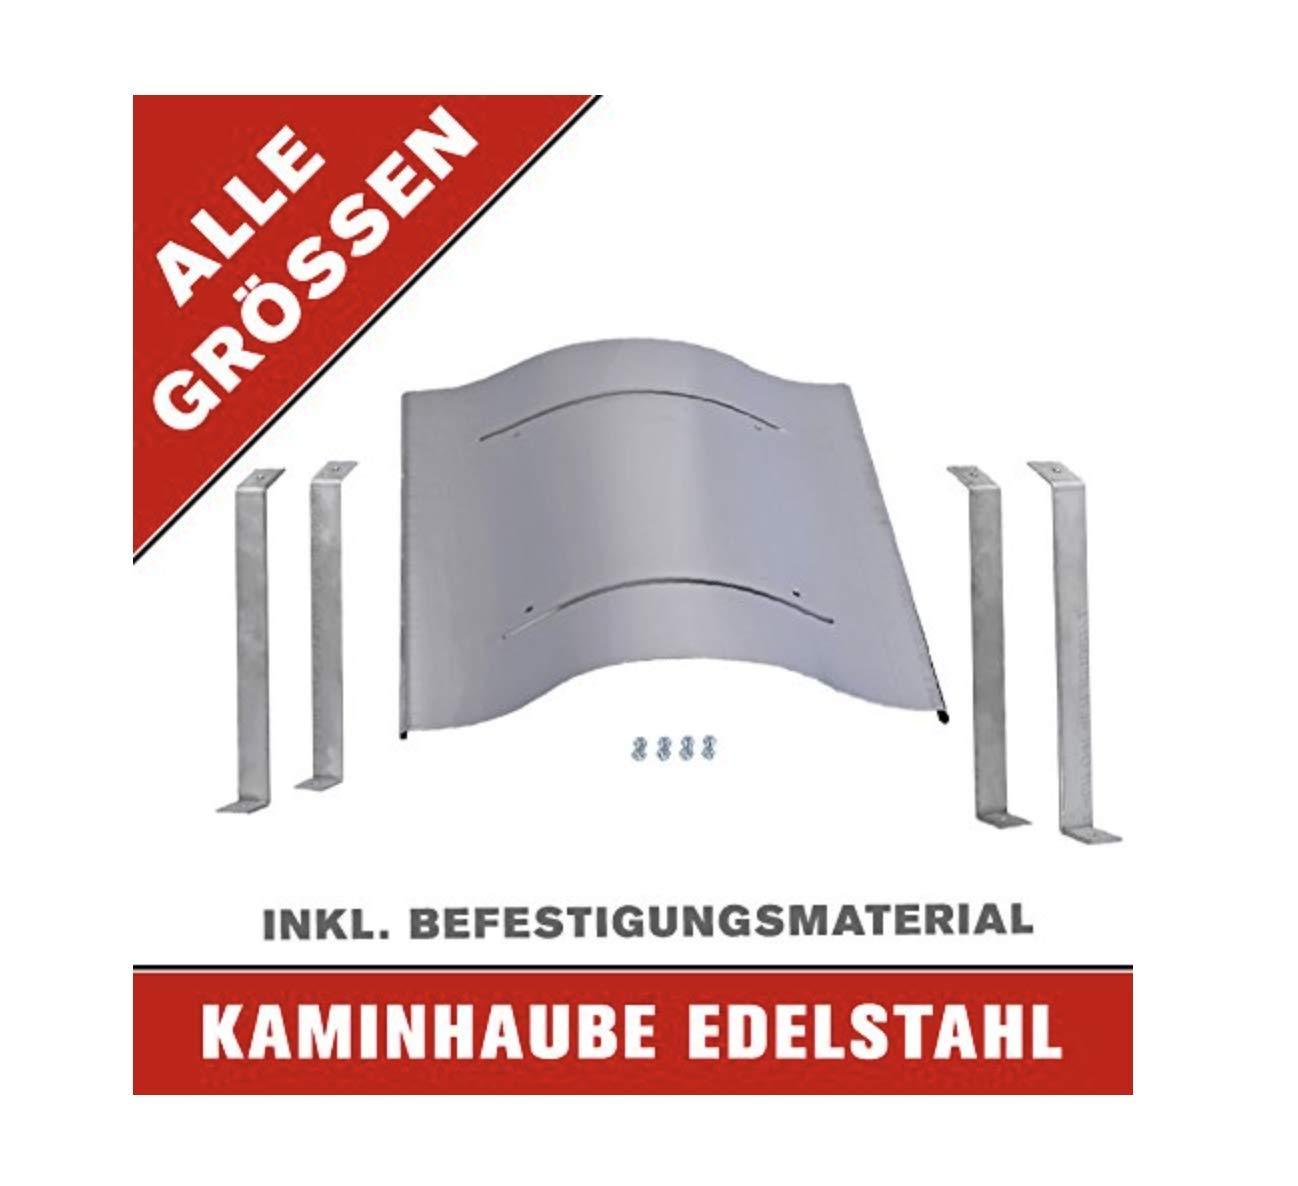 Nischenmarkt Massive Schornsteinabdeckung in Edelstahl 700 x 800 mm